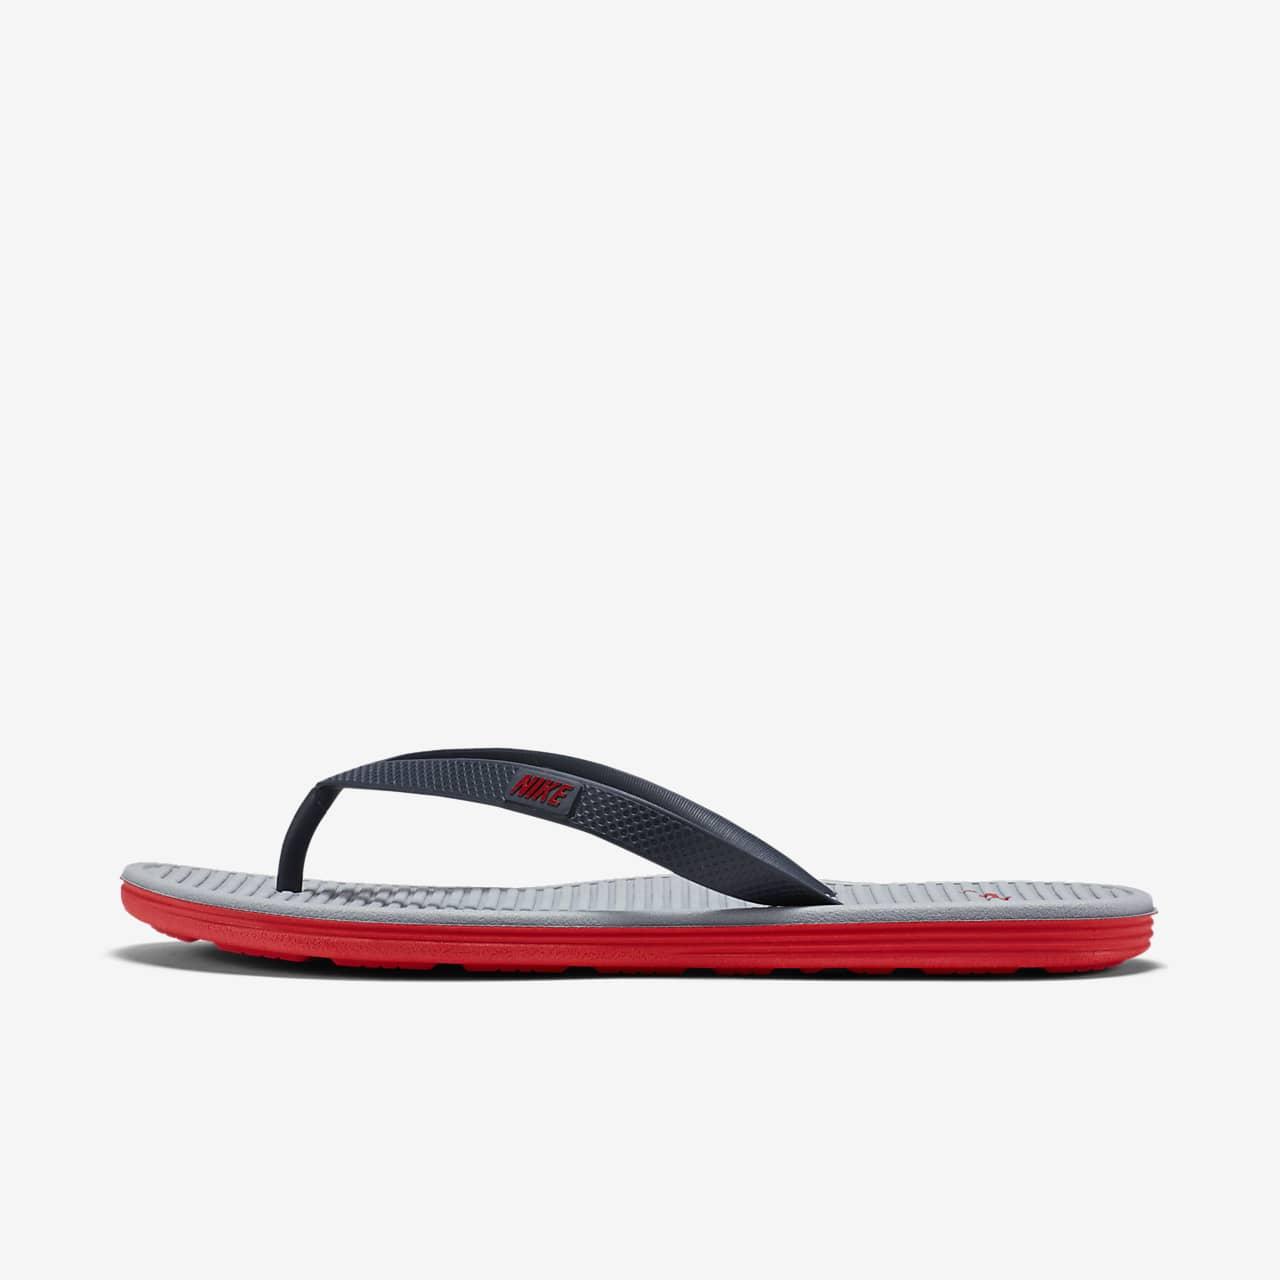 Nike Solarsoft 2 Men's Flip-Flop